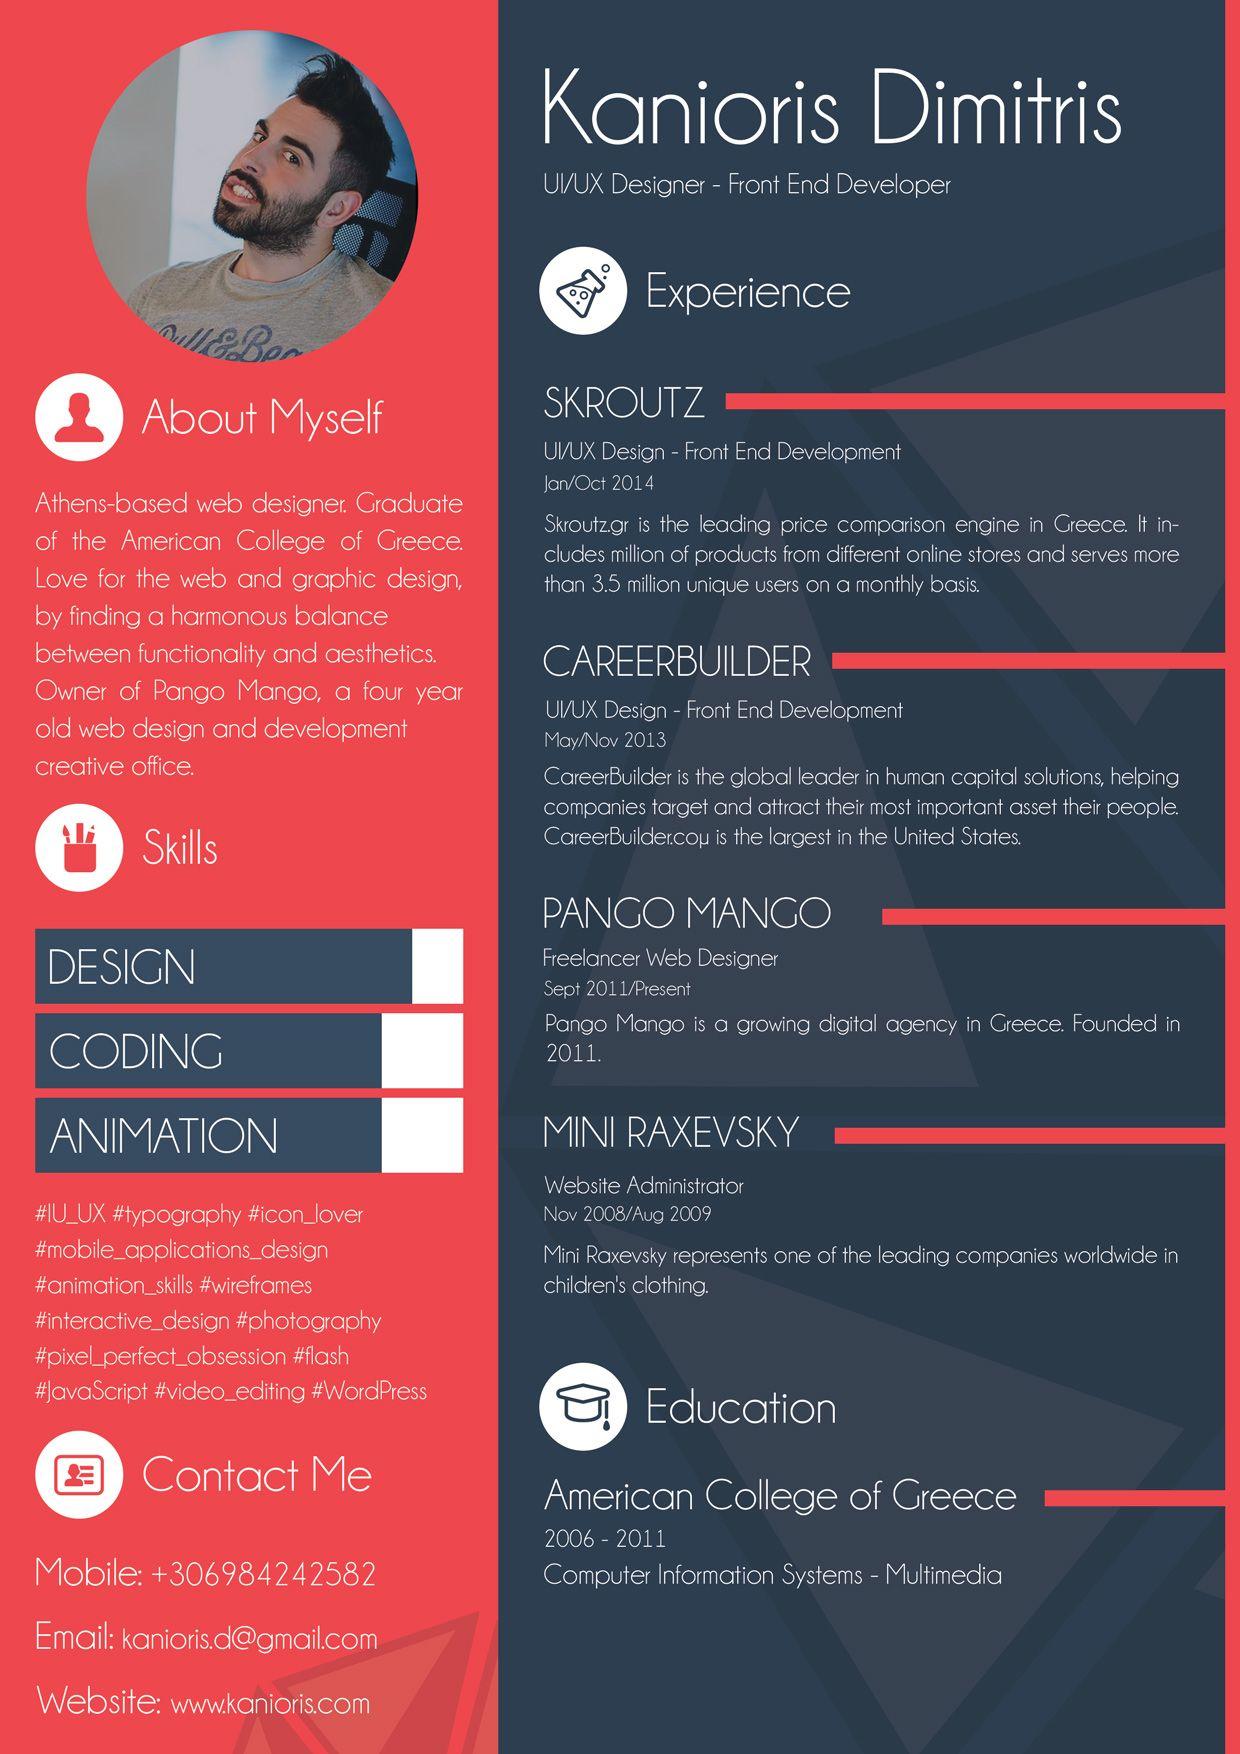 Resume Designer Kanioris_Dimitris_Cv 1240×1754  Resumé  Pinterest  Design